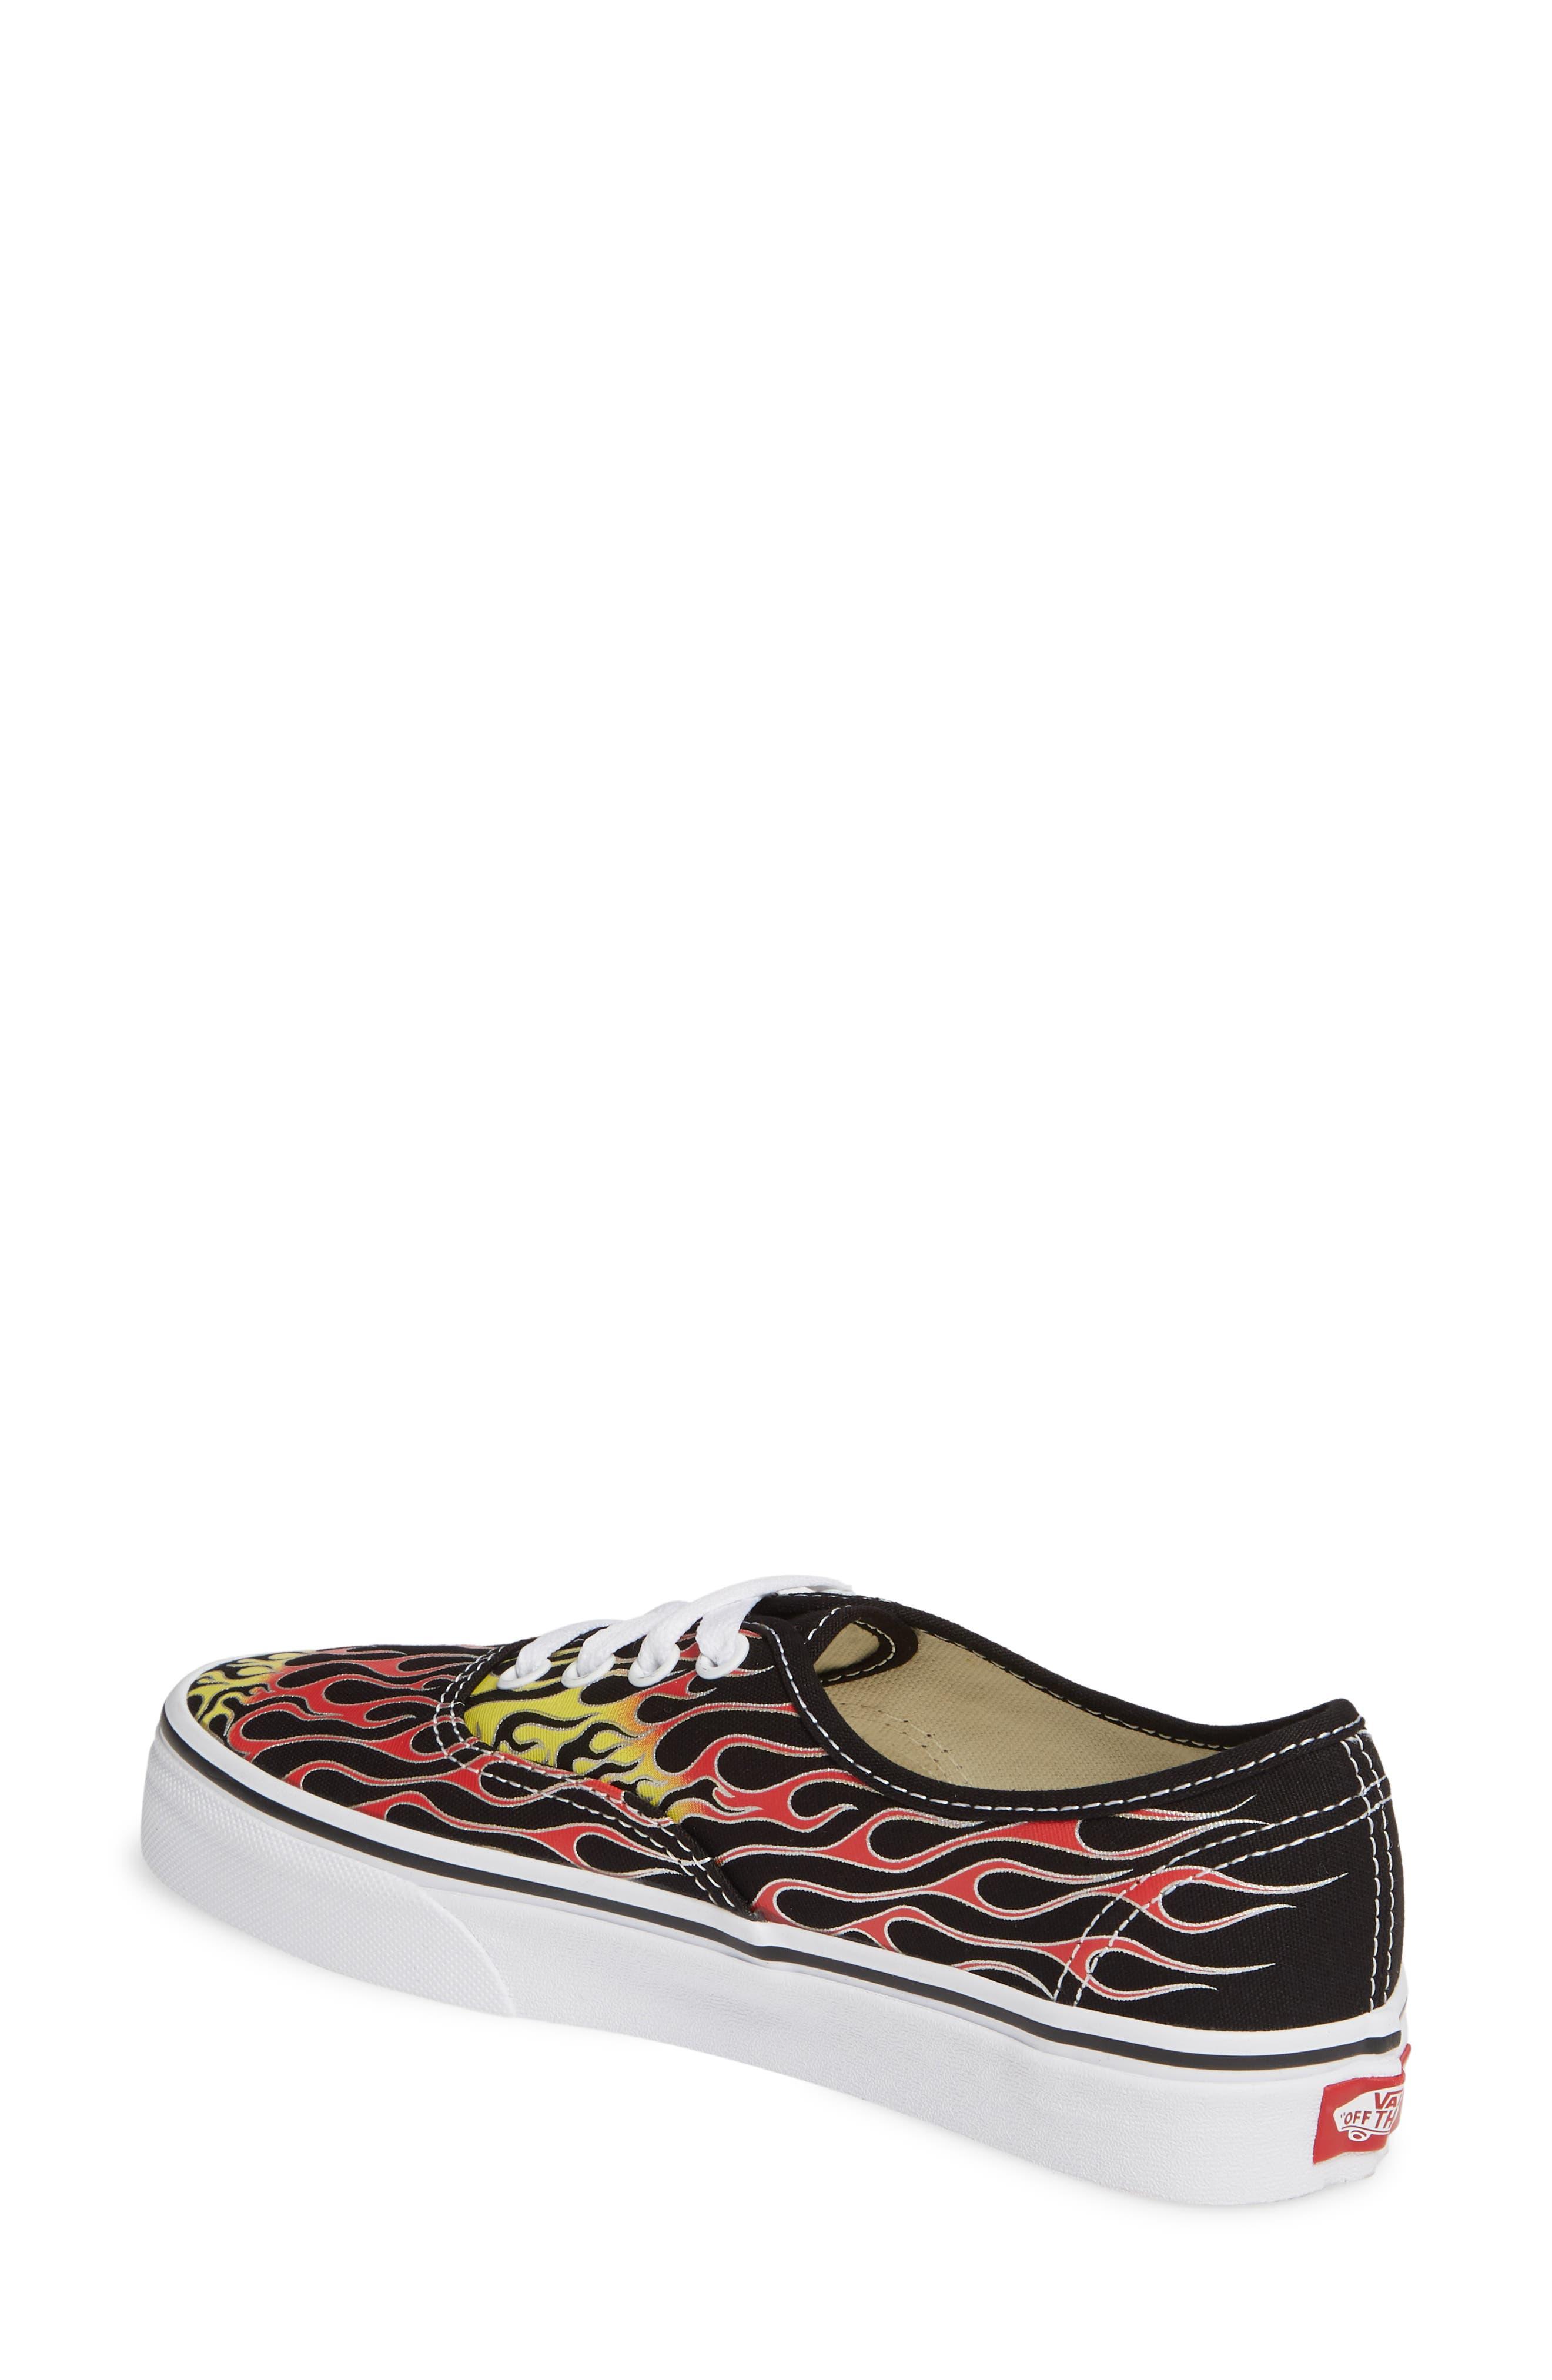 ,                             'Authentic' Sneaker,                             Alternate thumbnail 112, color,                             010